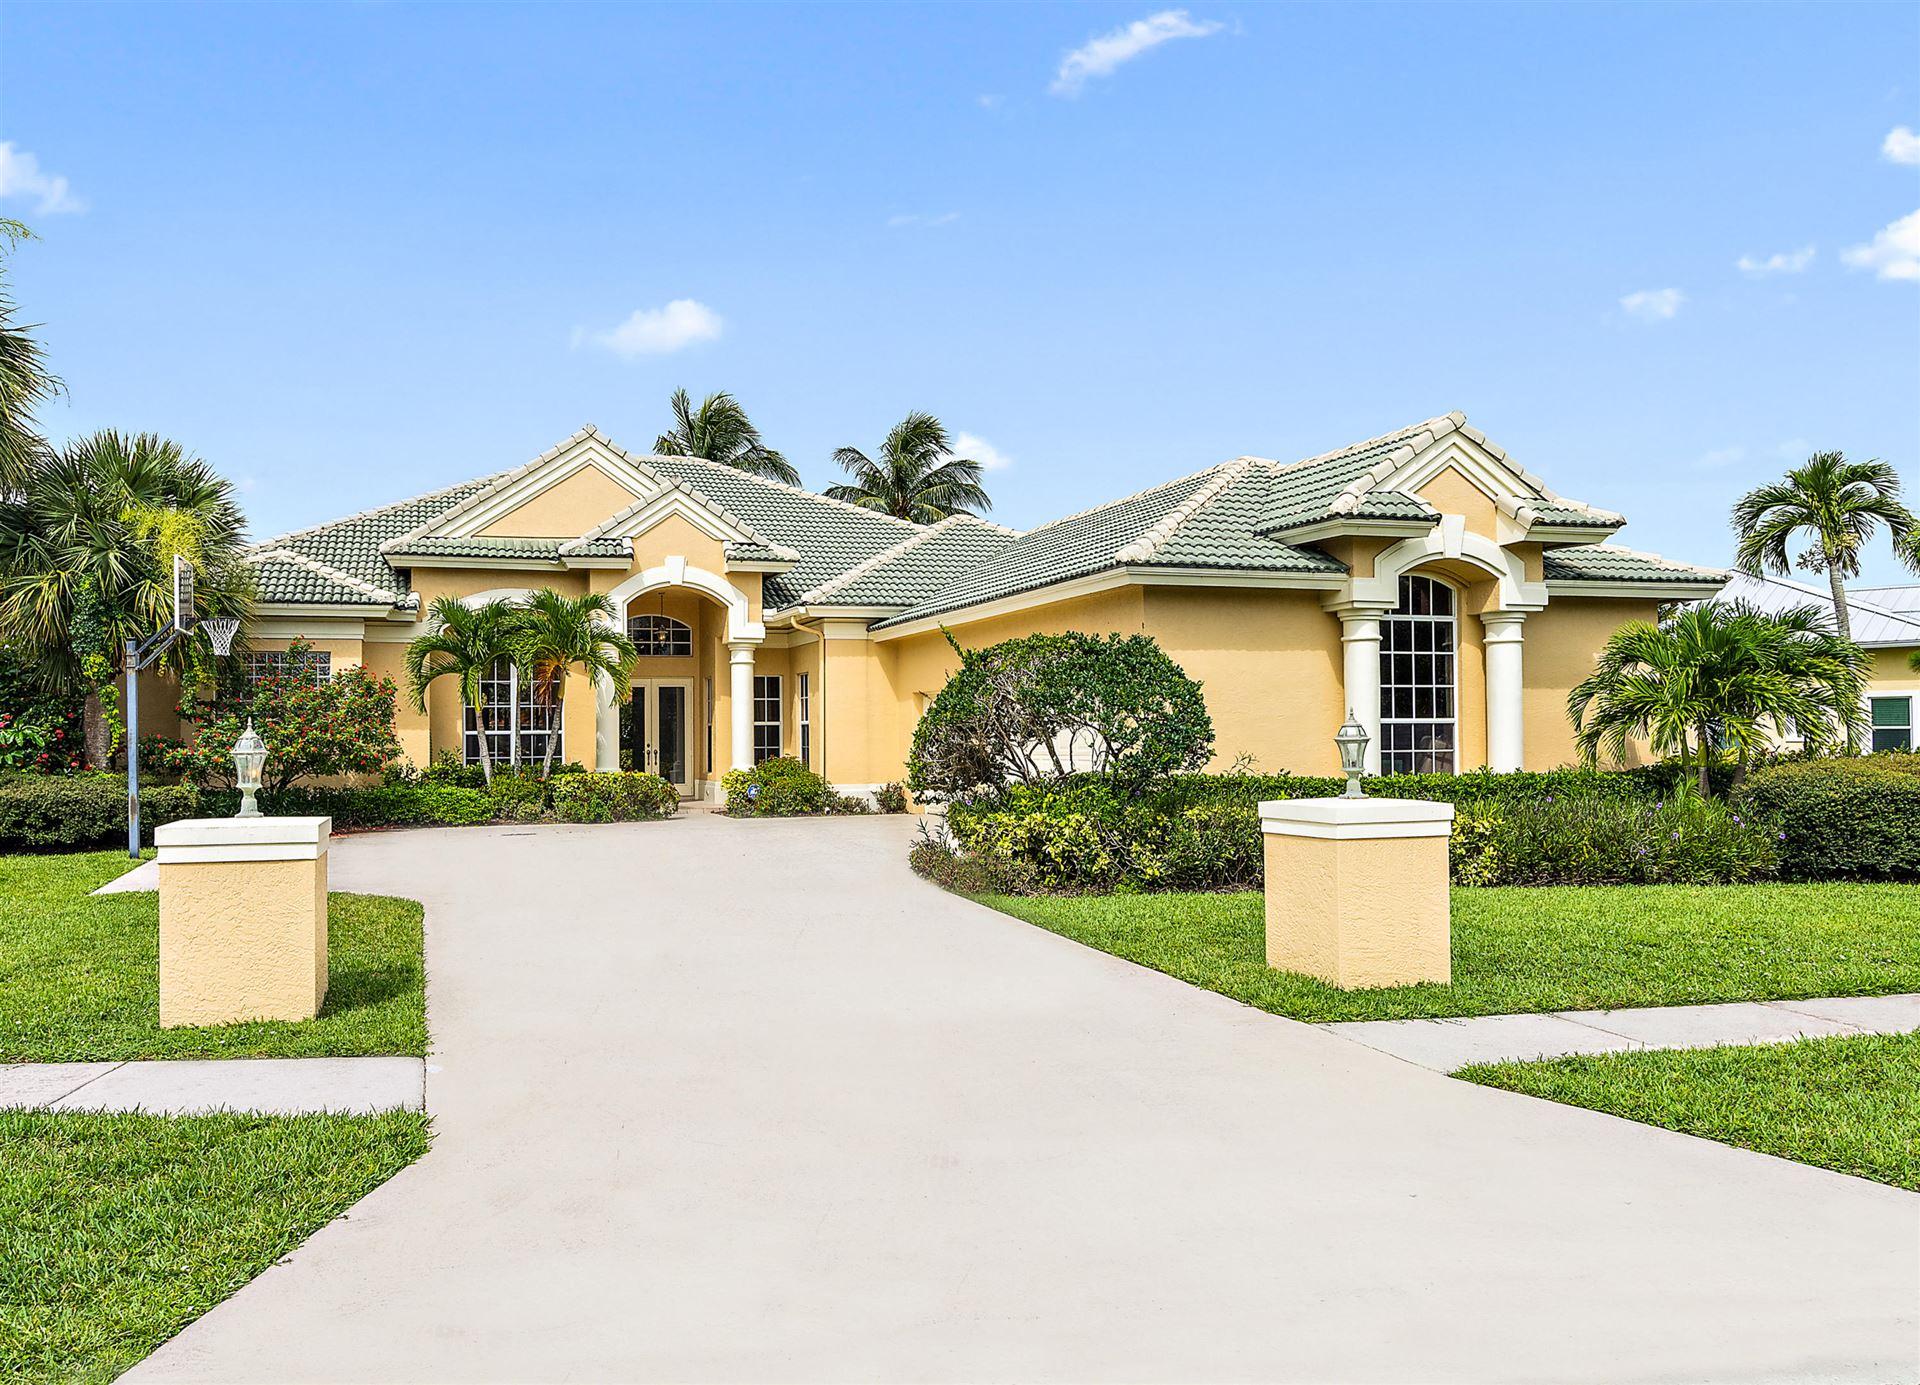 18585 Lakeside Gardens Drive, Jupiter, FL 33458 - MLS#: RX-10731309